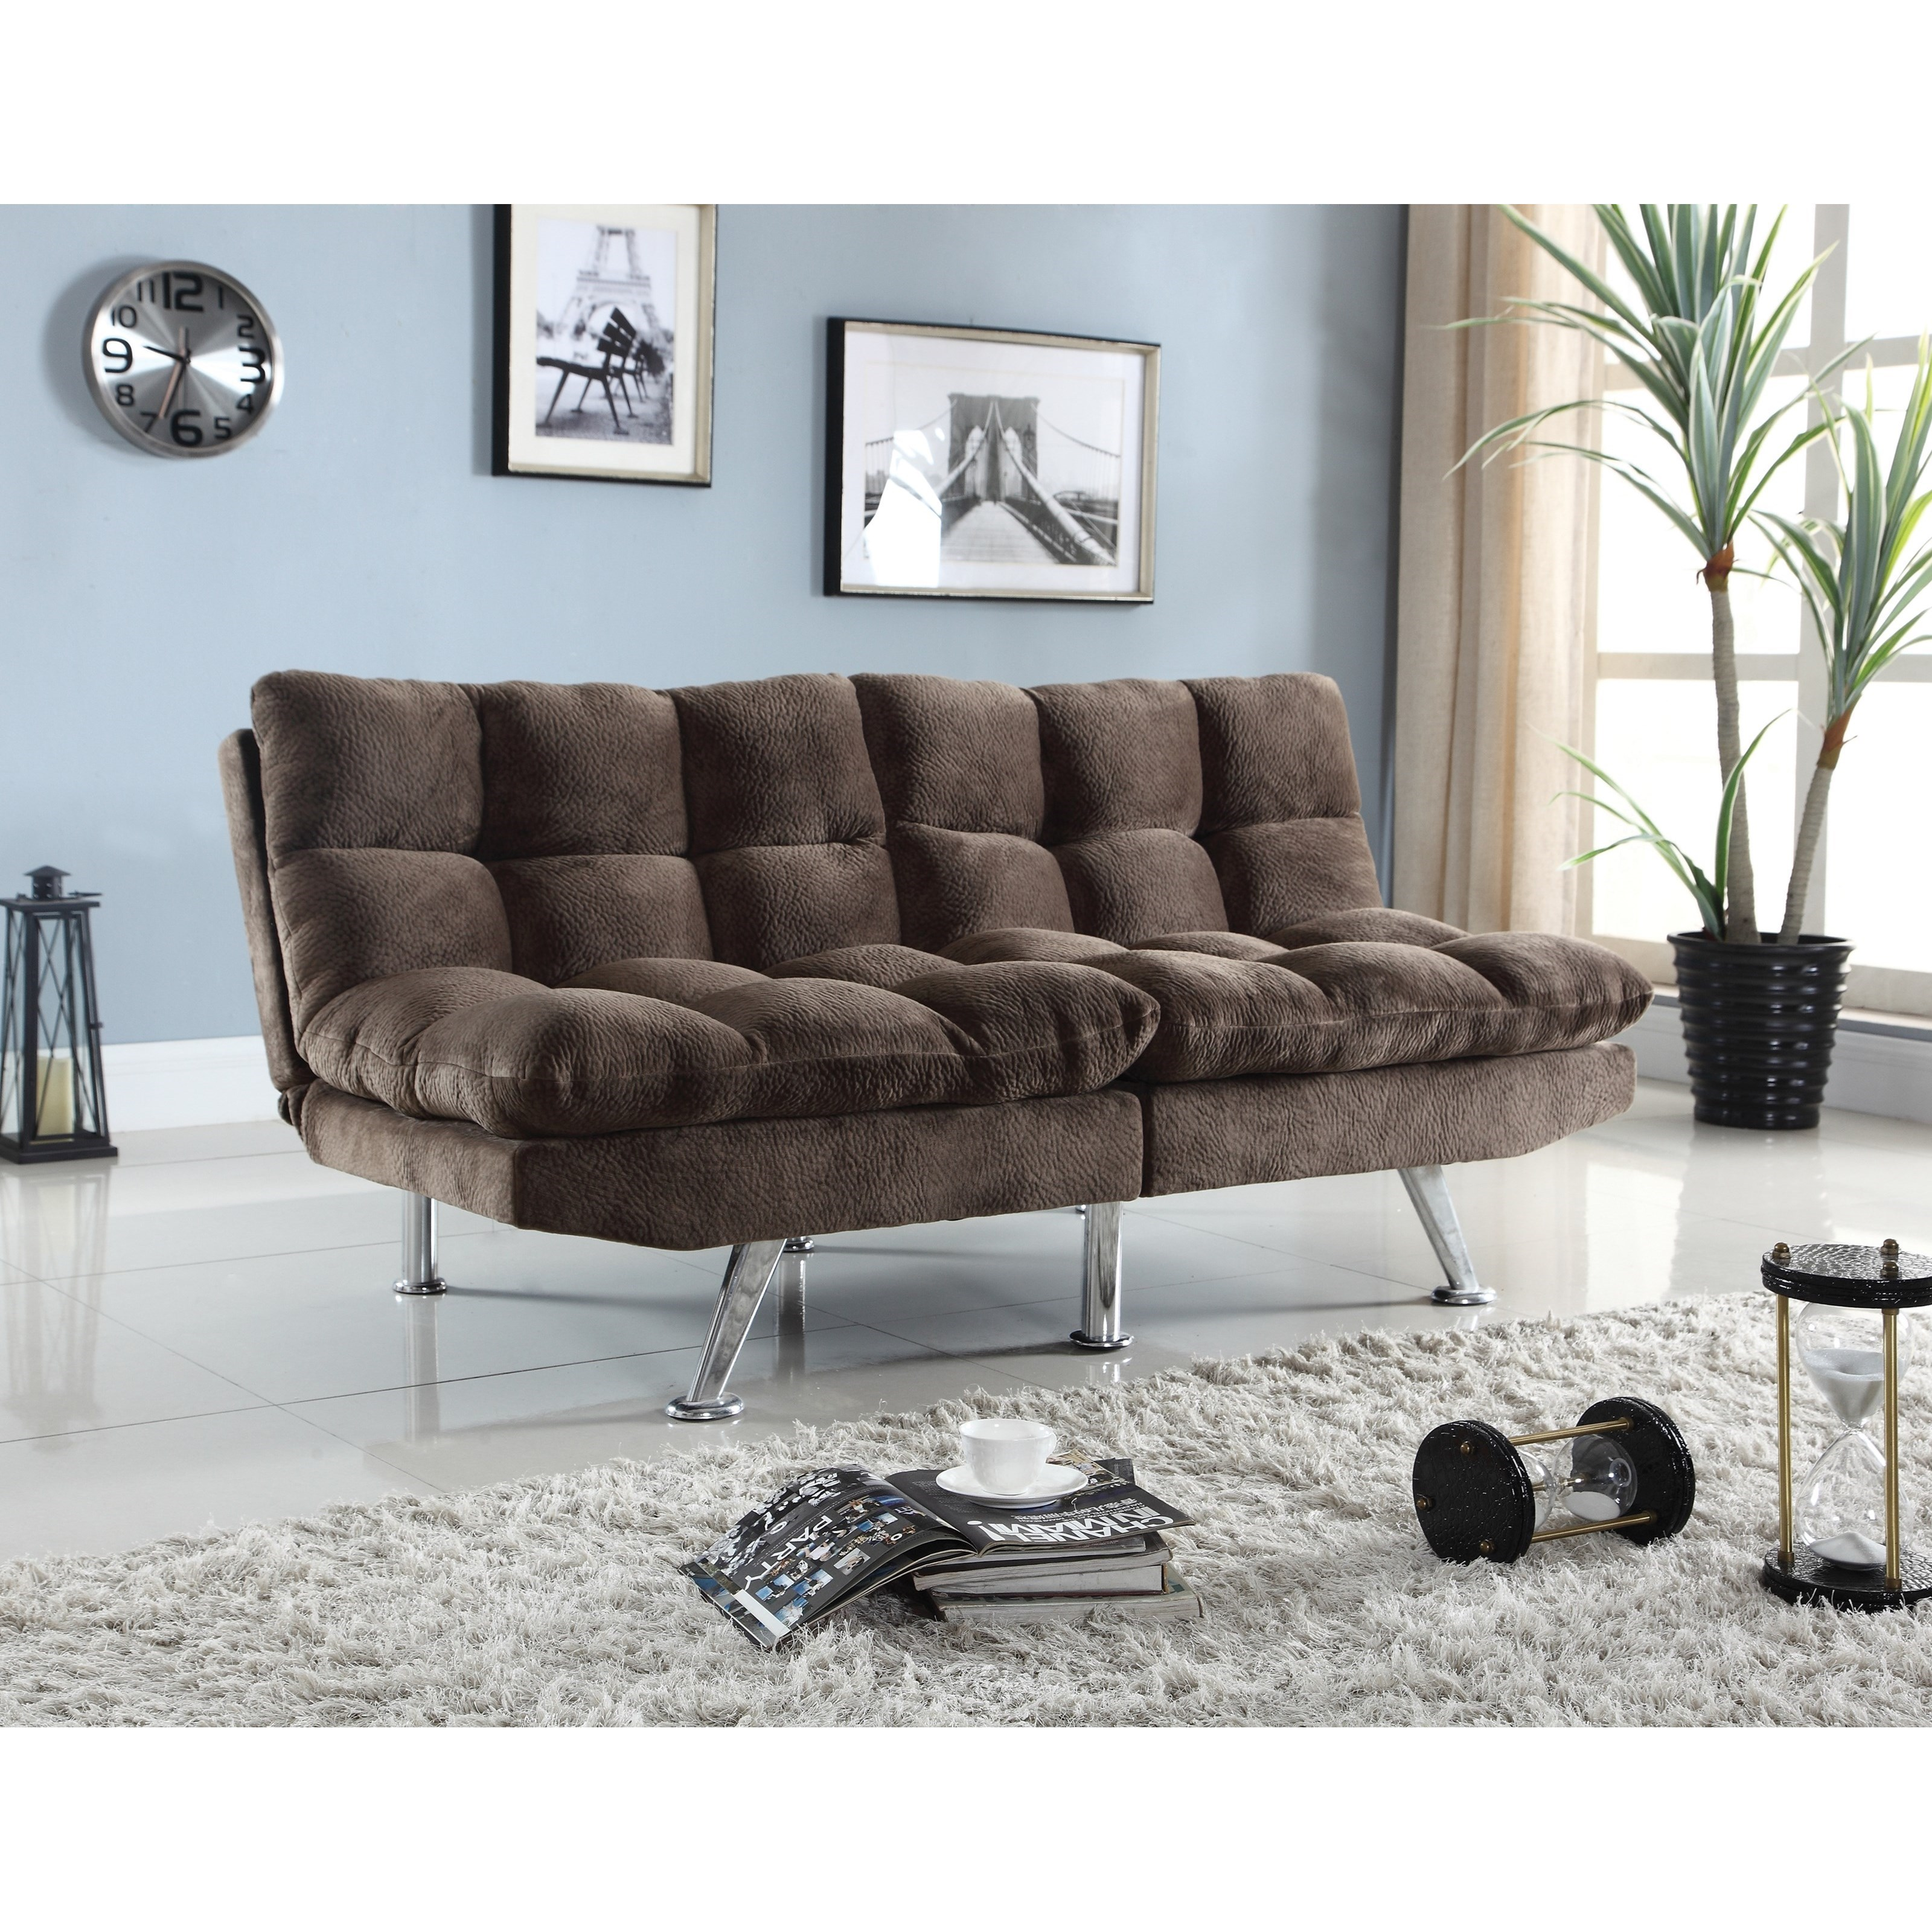 Coaster Futons Sofa Bed Item Number 505127